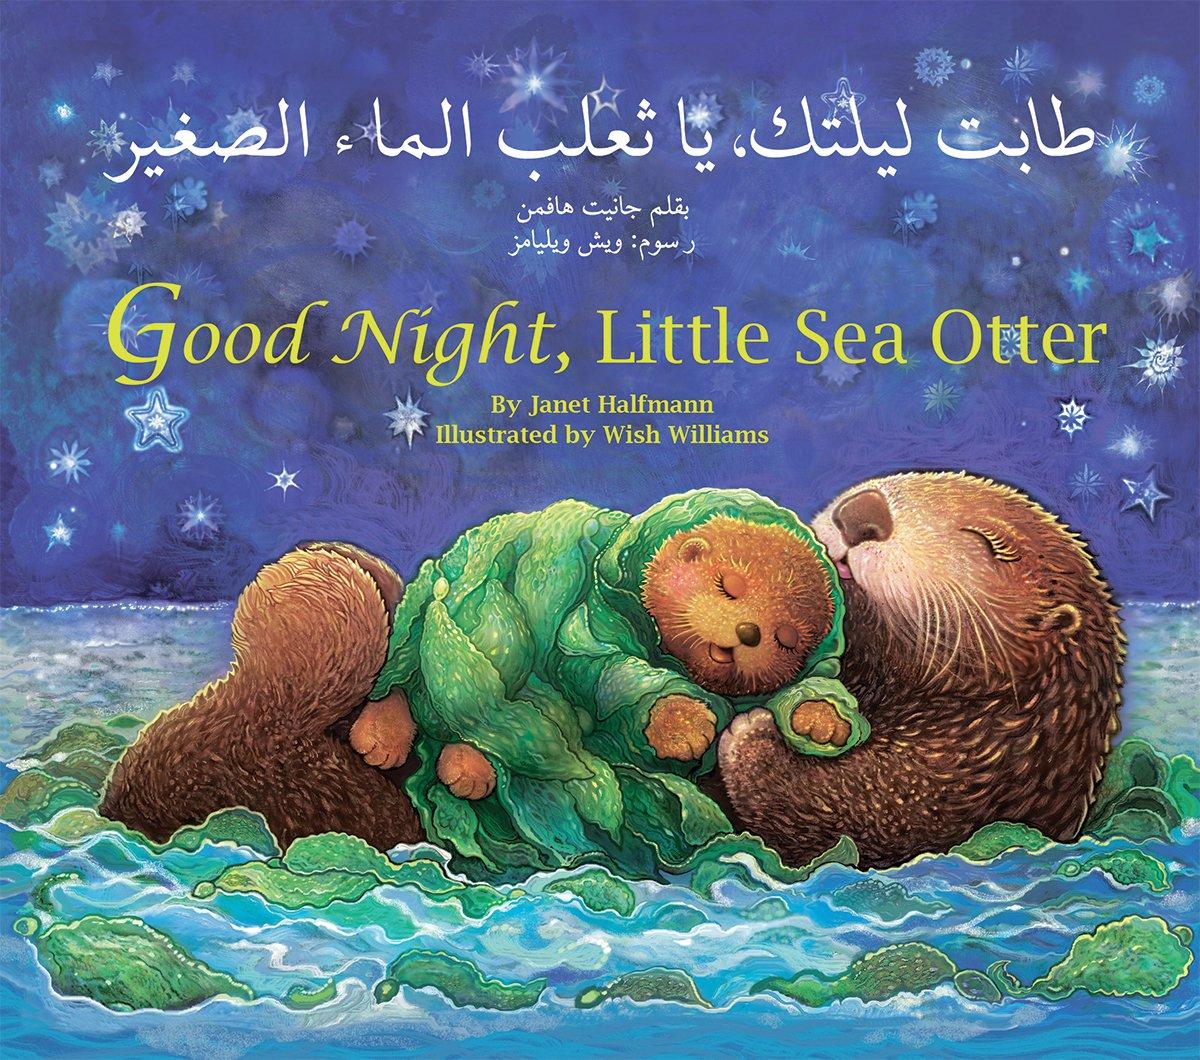 Good Night, Little Sea Otter (Arabic/English) (Arabic and English Edition)